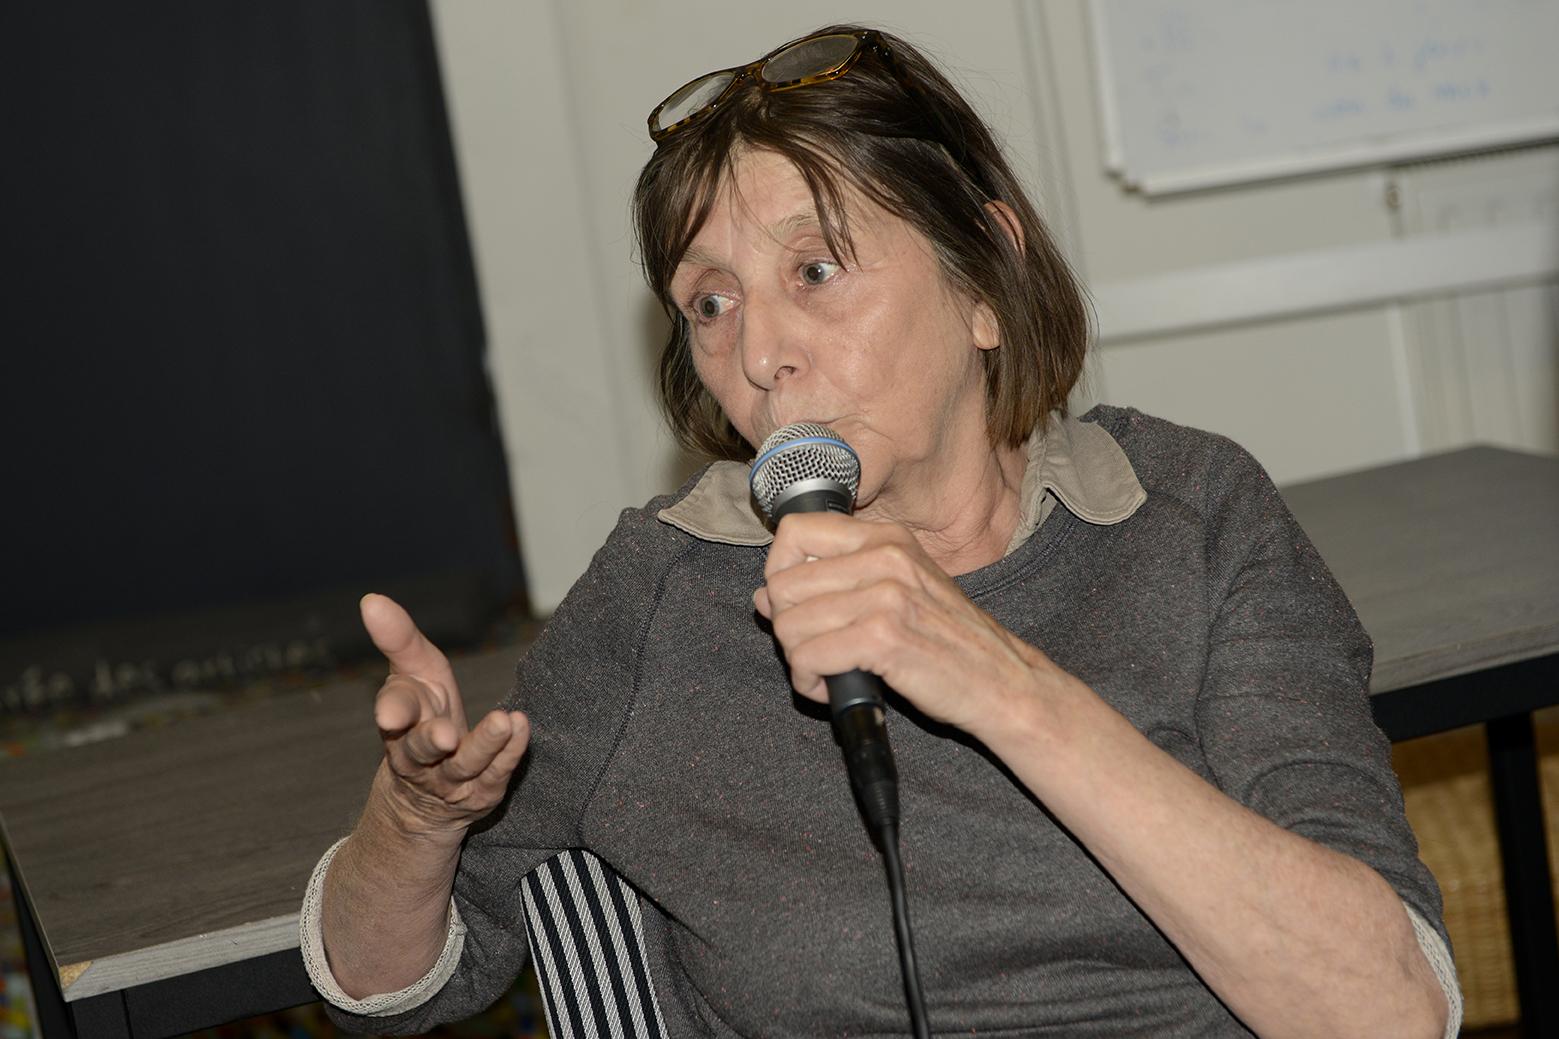 Nicole Enouf du Grain de Sable